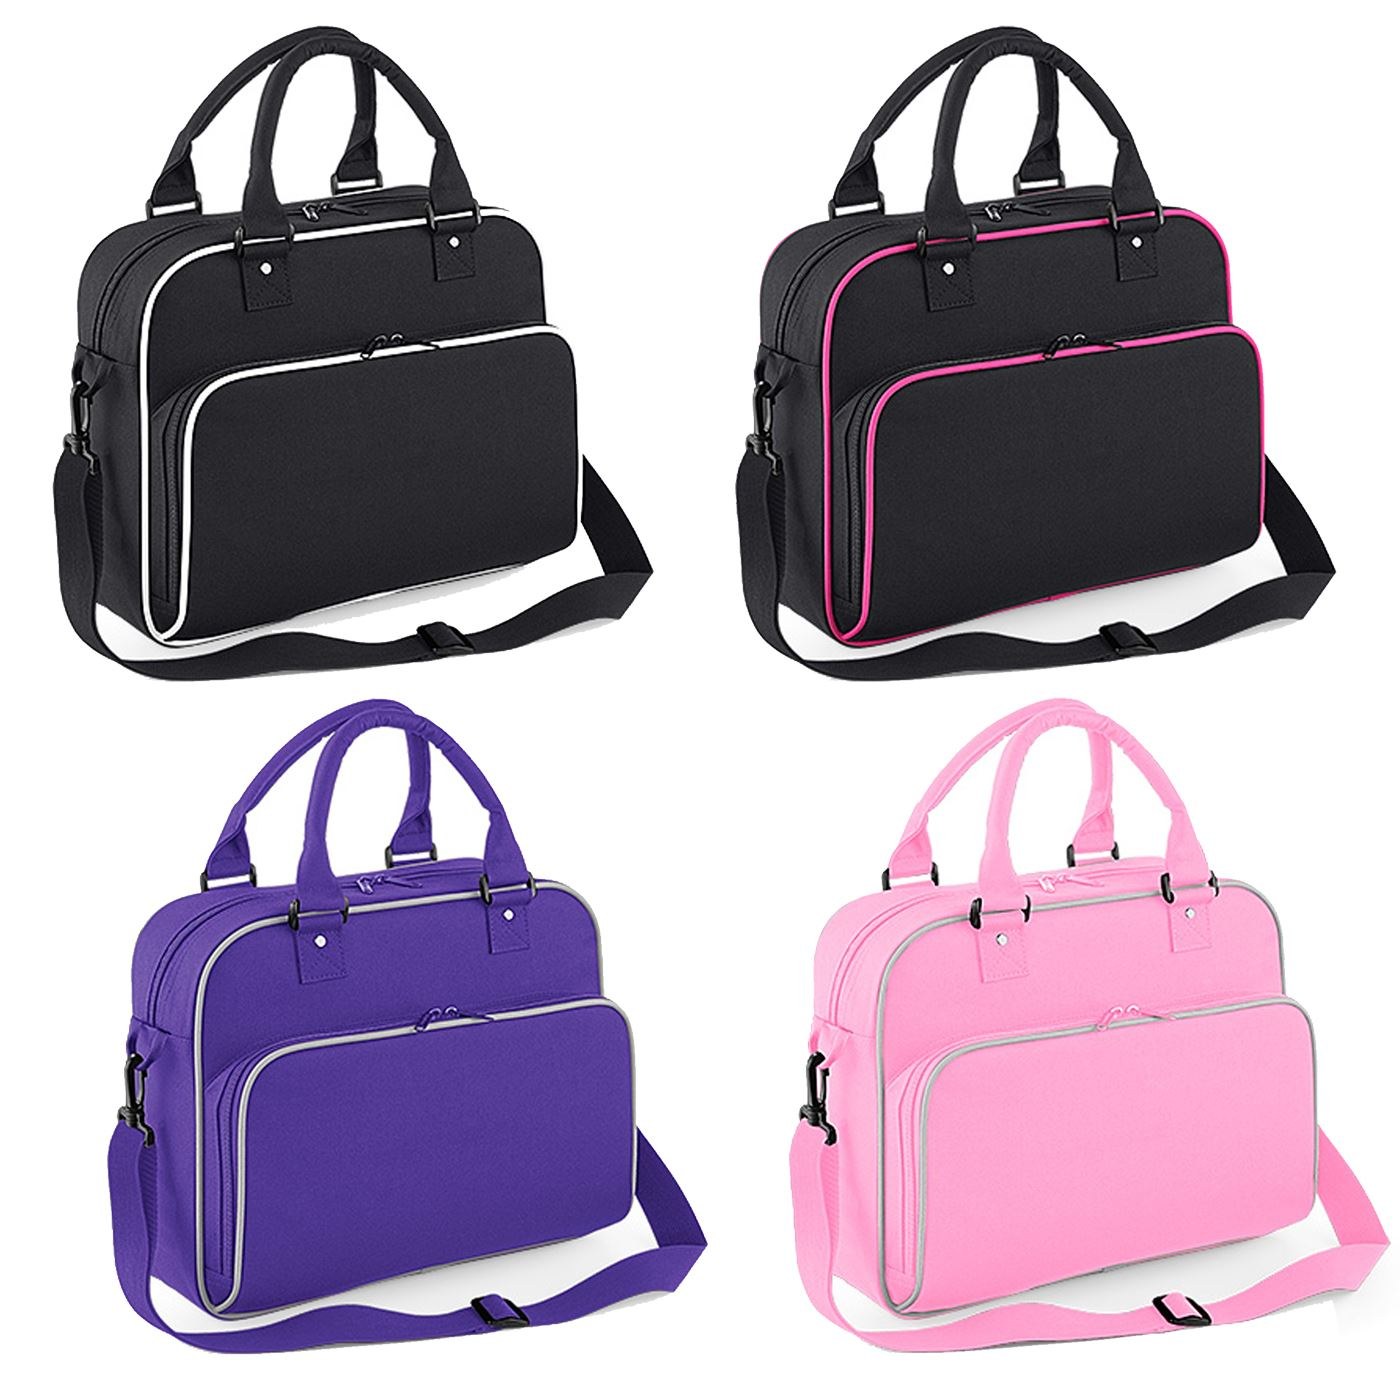 9b68c3bc939 Details about BagBase Dance Bag Ballet Tap Kit Holdall Sports Bag Gymnastics